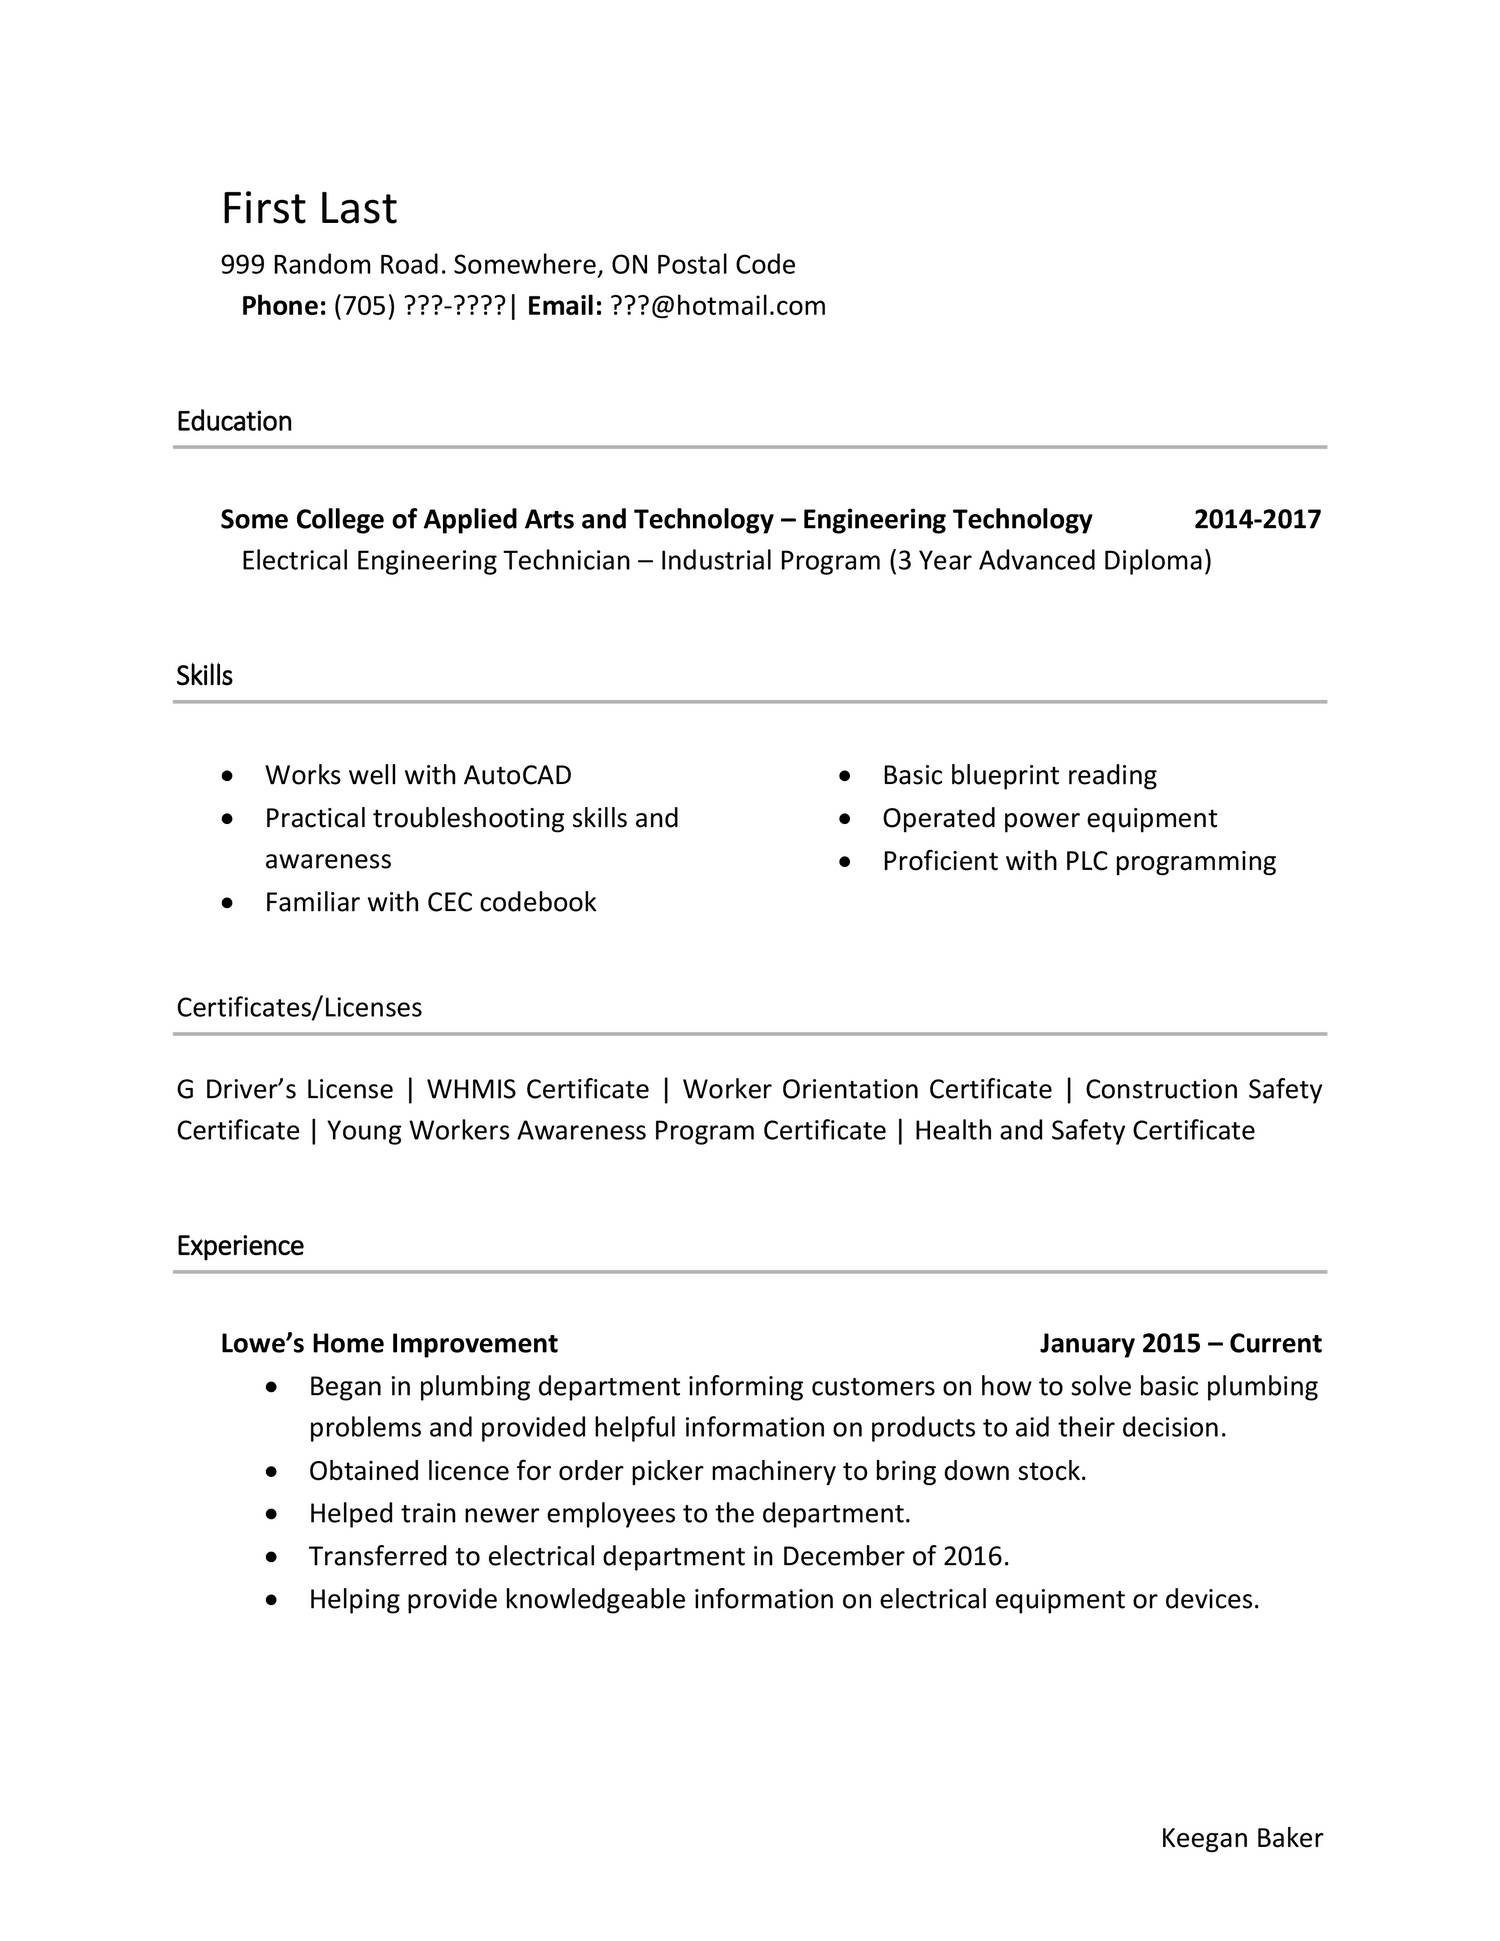 Reddit Critique Resume Docx Docdroid